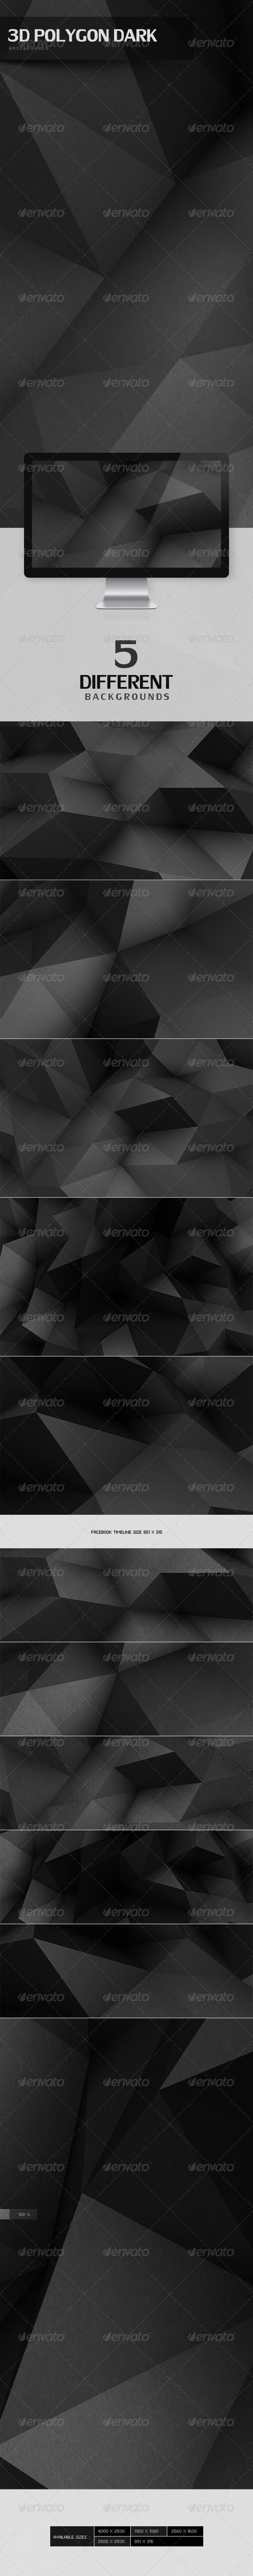 3d-Polygon-Dark-Backgrounds-wallpaper-wp3801276